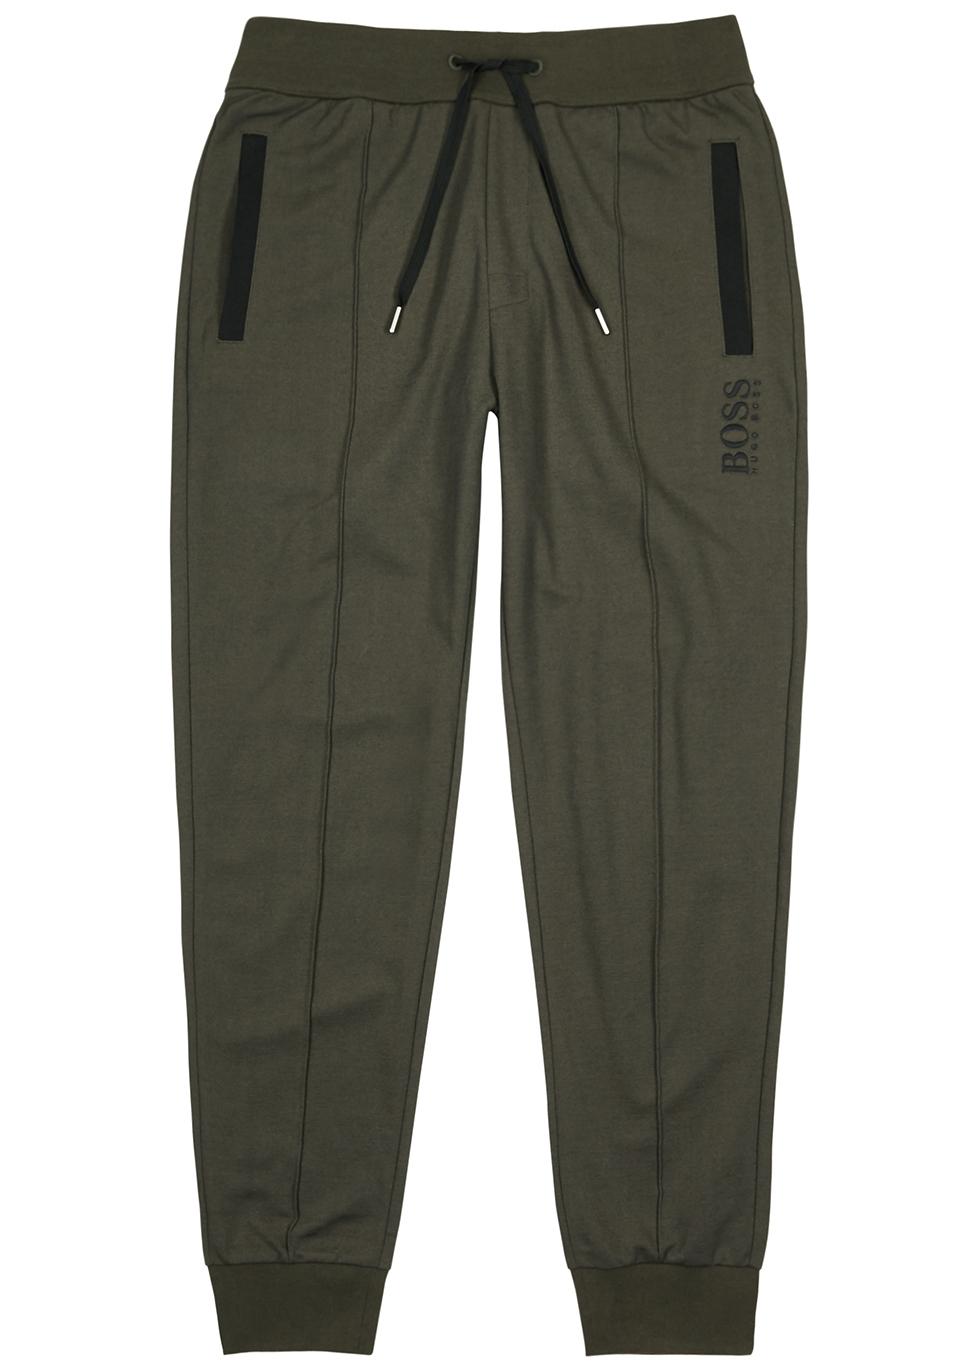 Army green jersey sweatpants